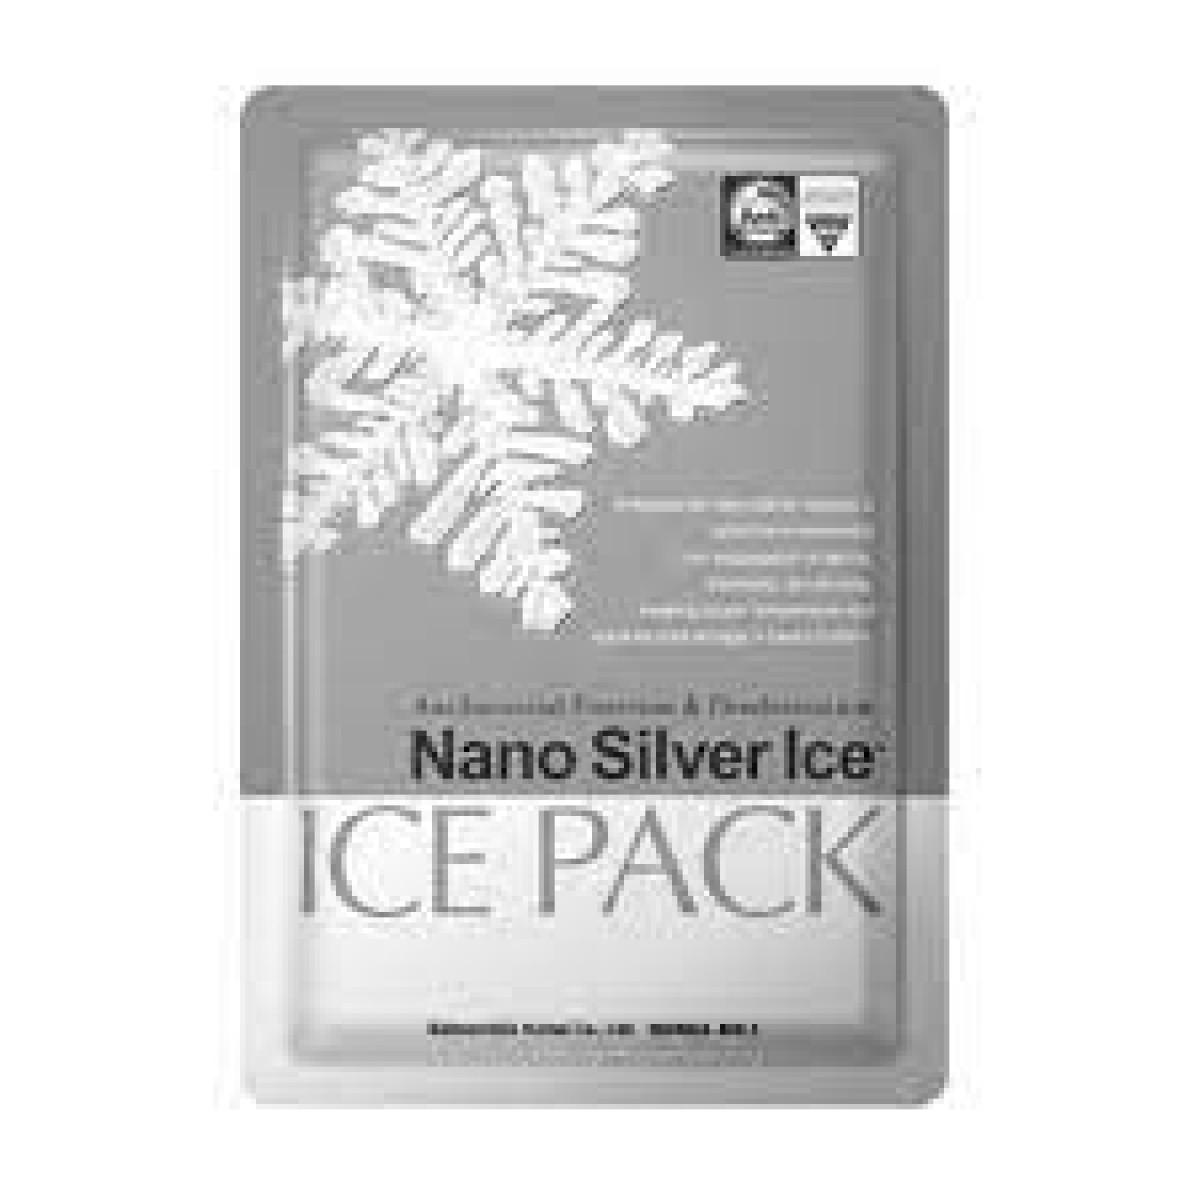 Ice Pack (Nano Silver) - Kico Baby Center